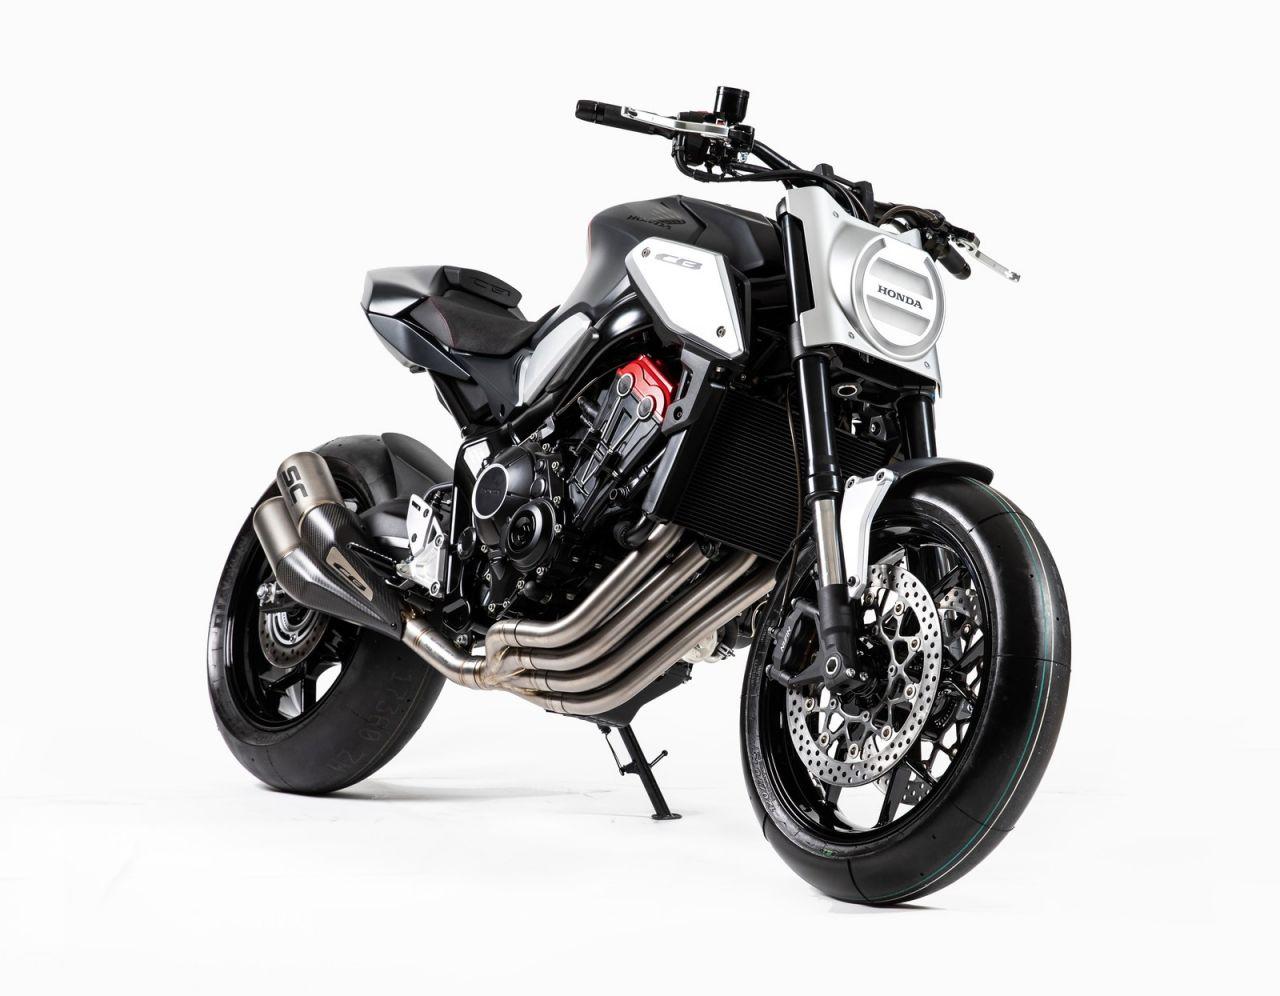 Honda CB1100 RS 2017 | Moto | Naked - Andar de Moto